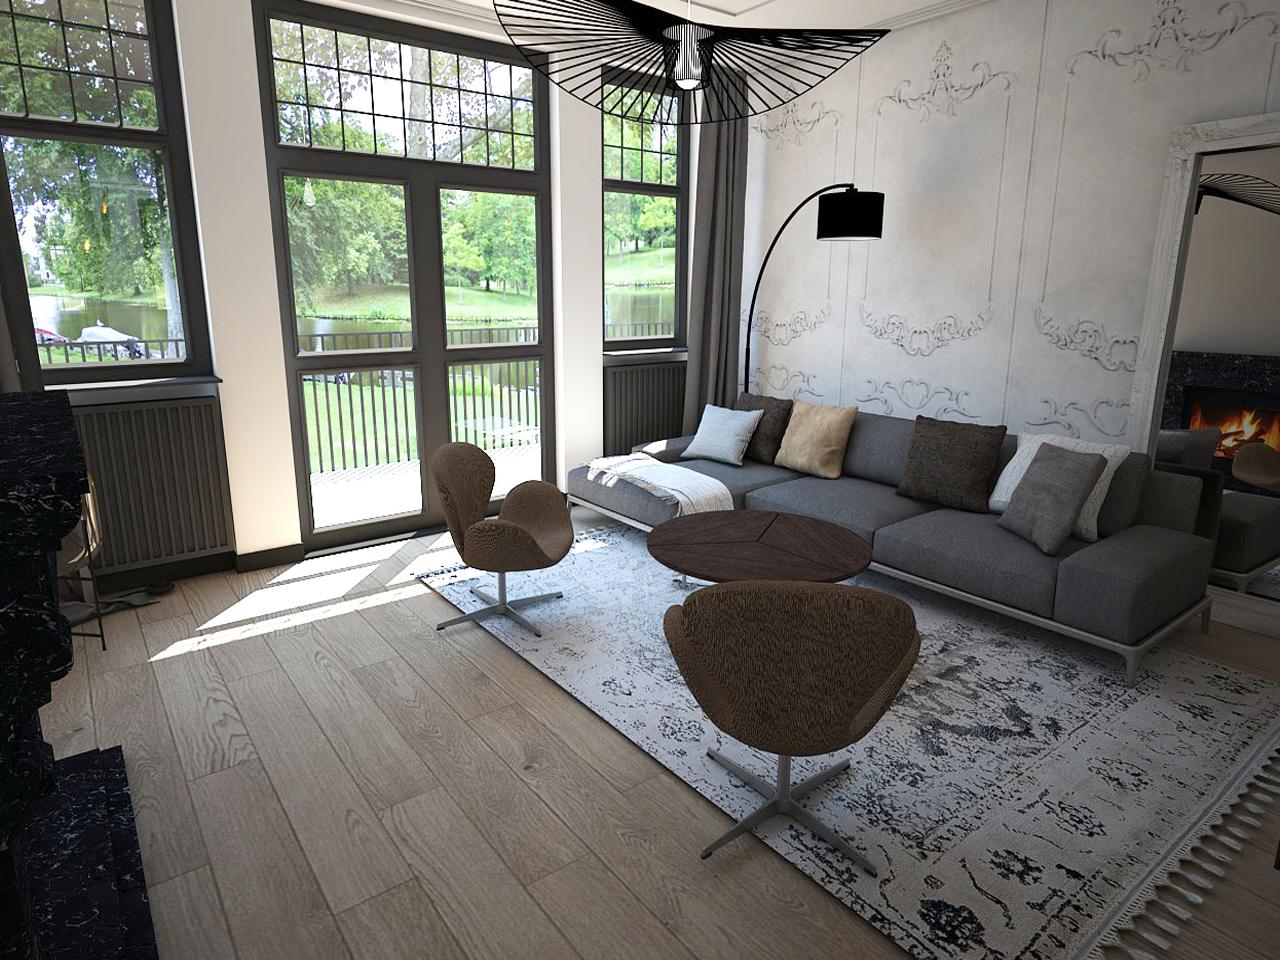 Modern klassiek interieur richting het raam - Studio em